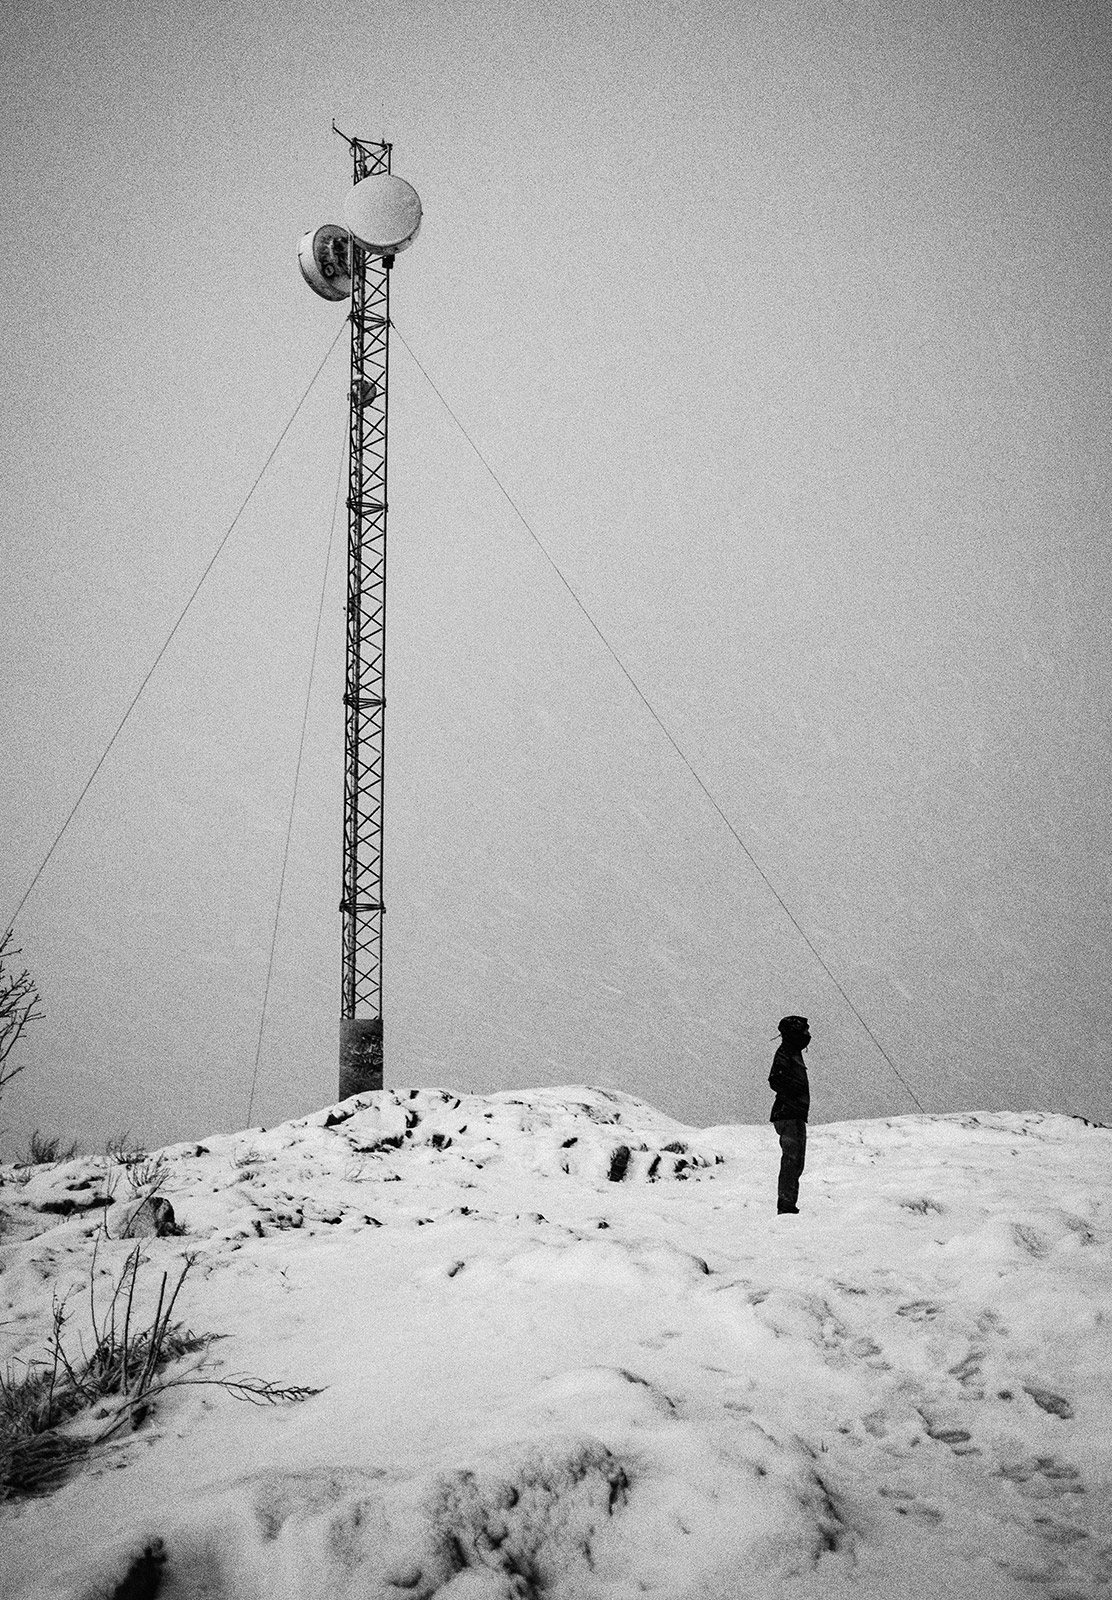 Man stood in snow next to mast